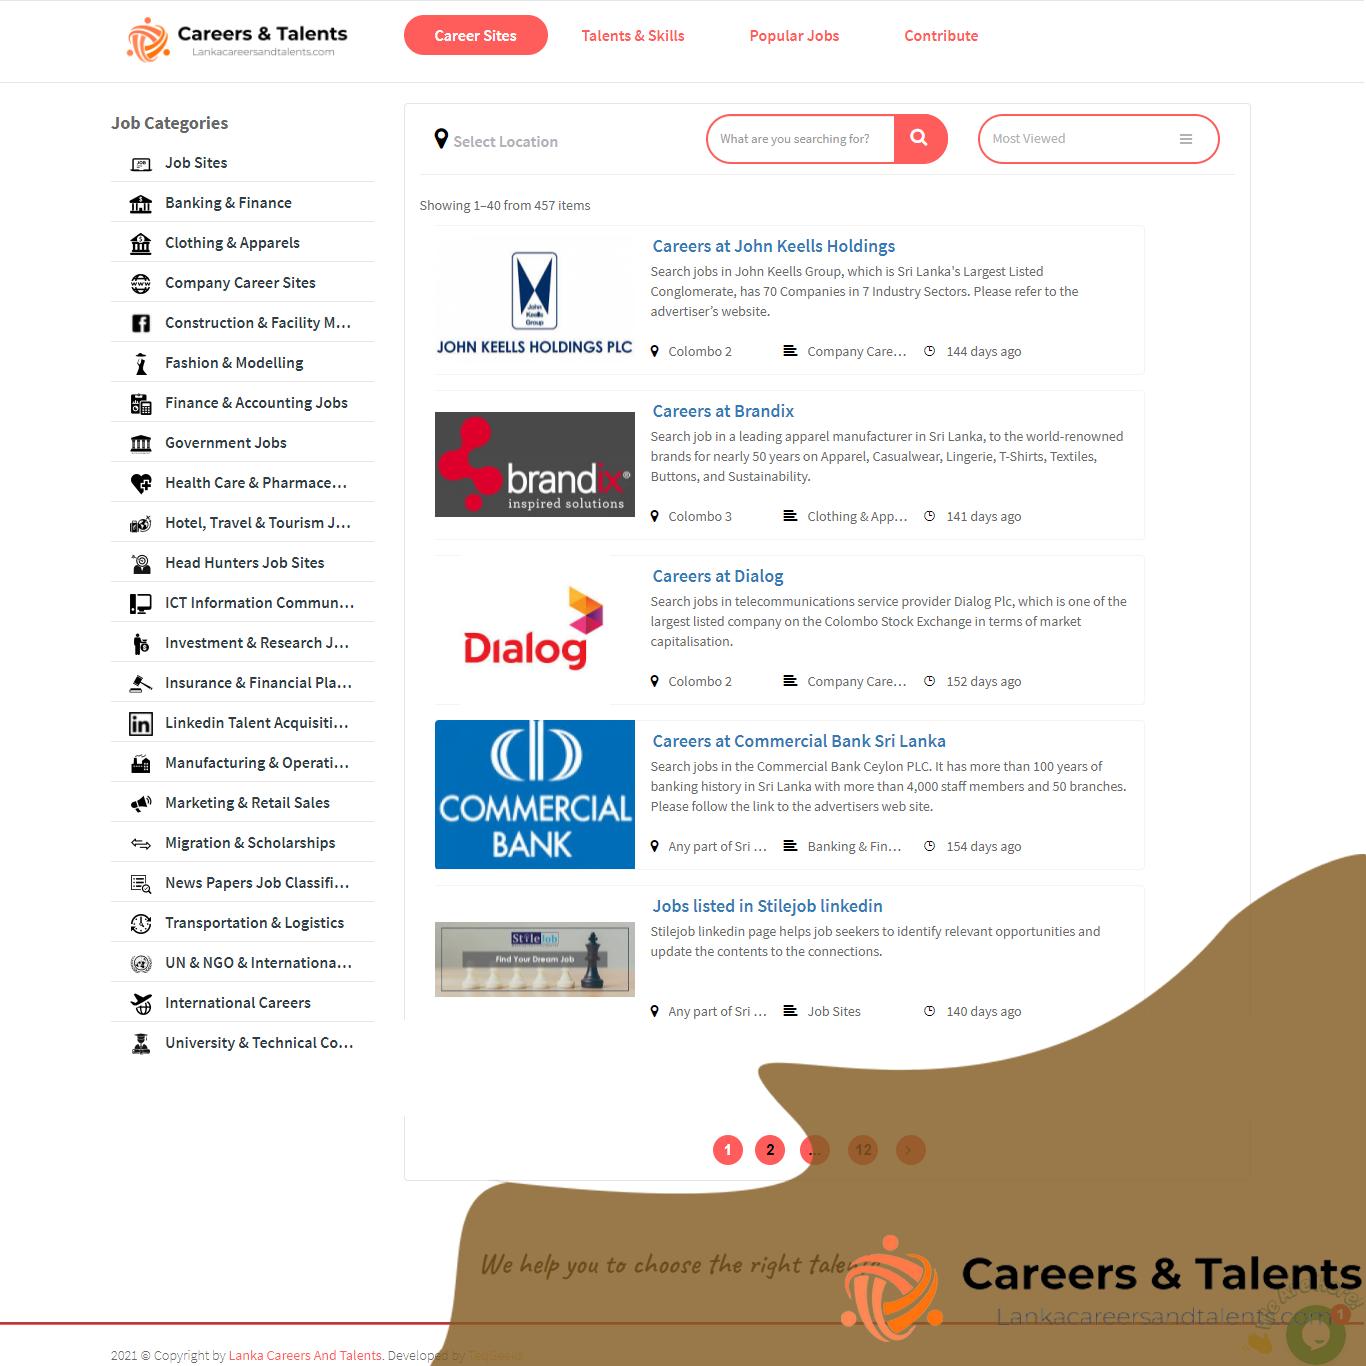 Lanka Careers and Talents